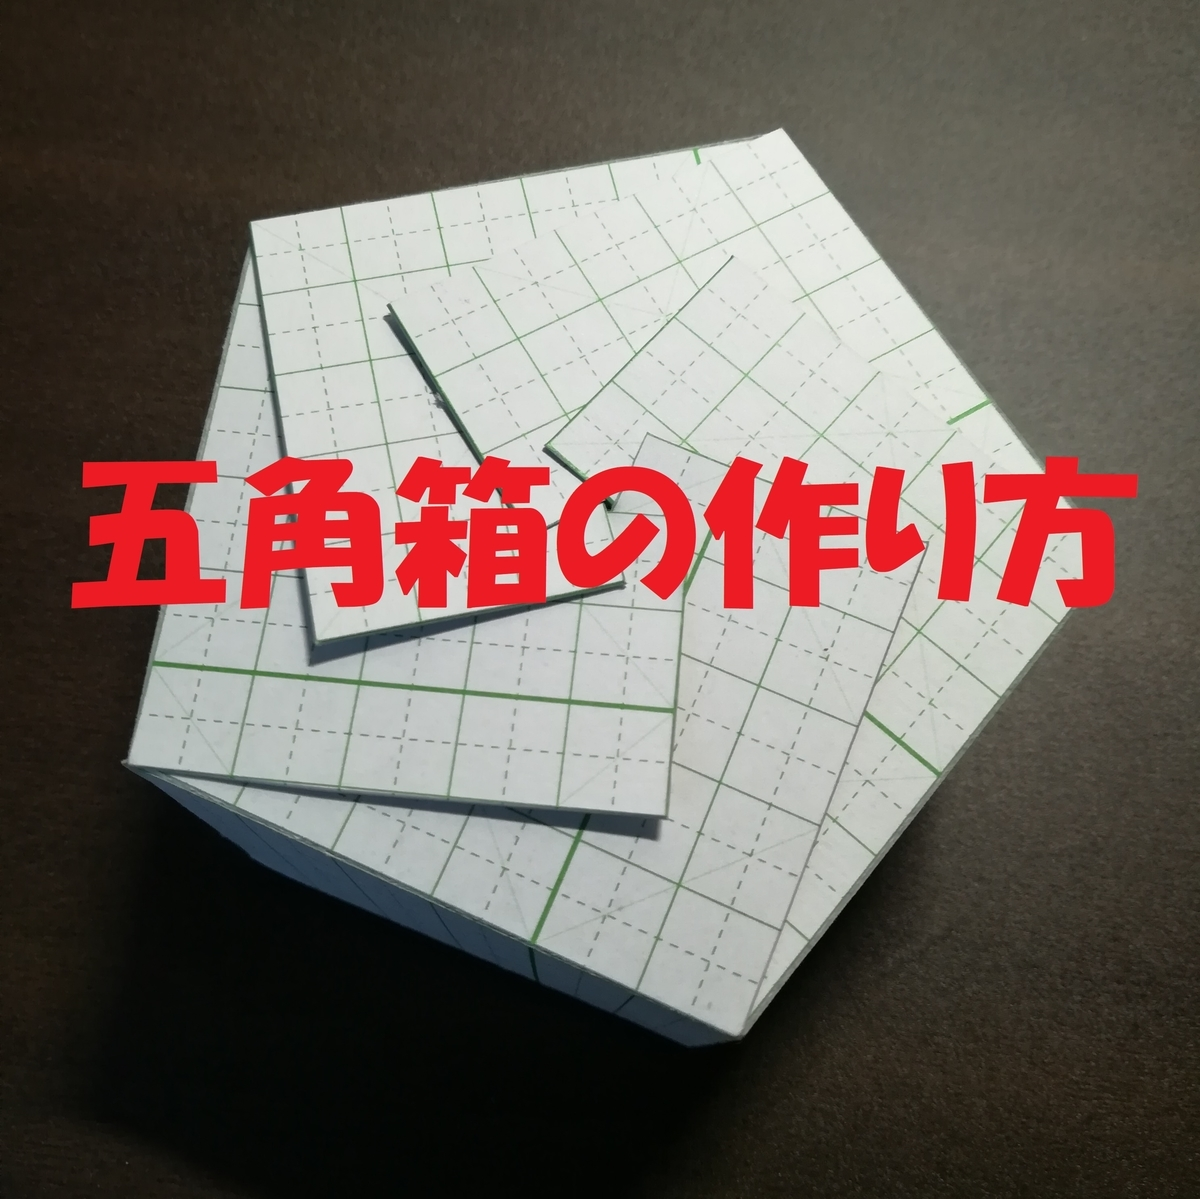 f:id:Hassium277:20200204224131j:plain